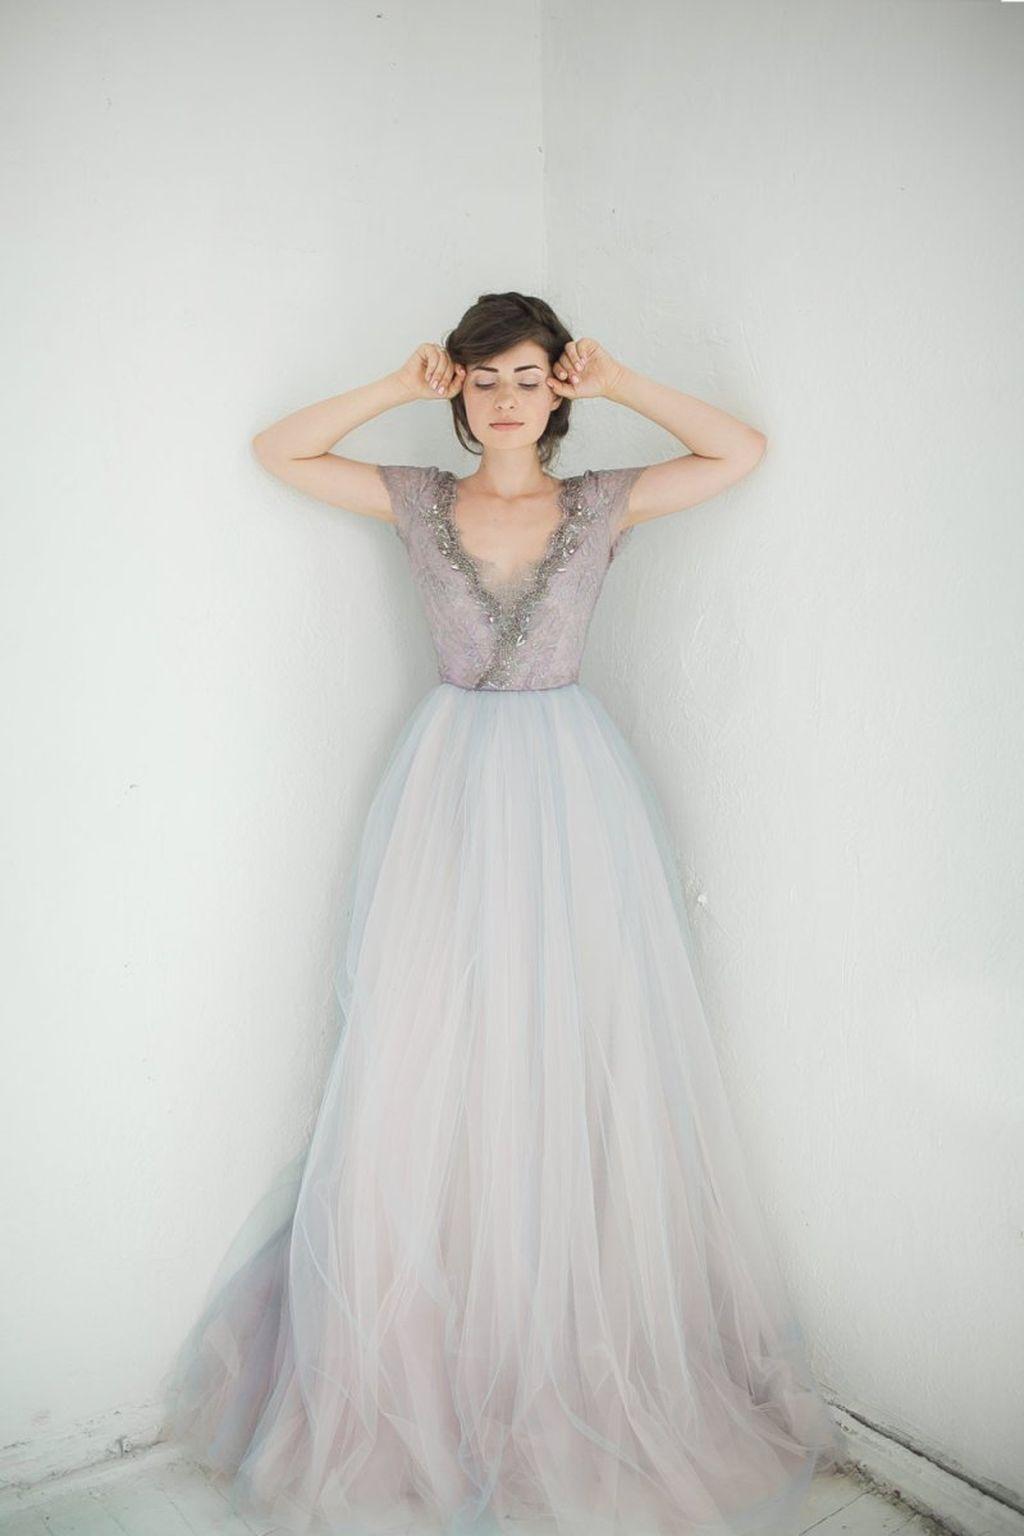 83 Beautiful Non Traditional Wedding Dress Ideas Every Women Will Love